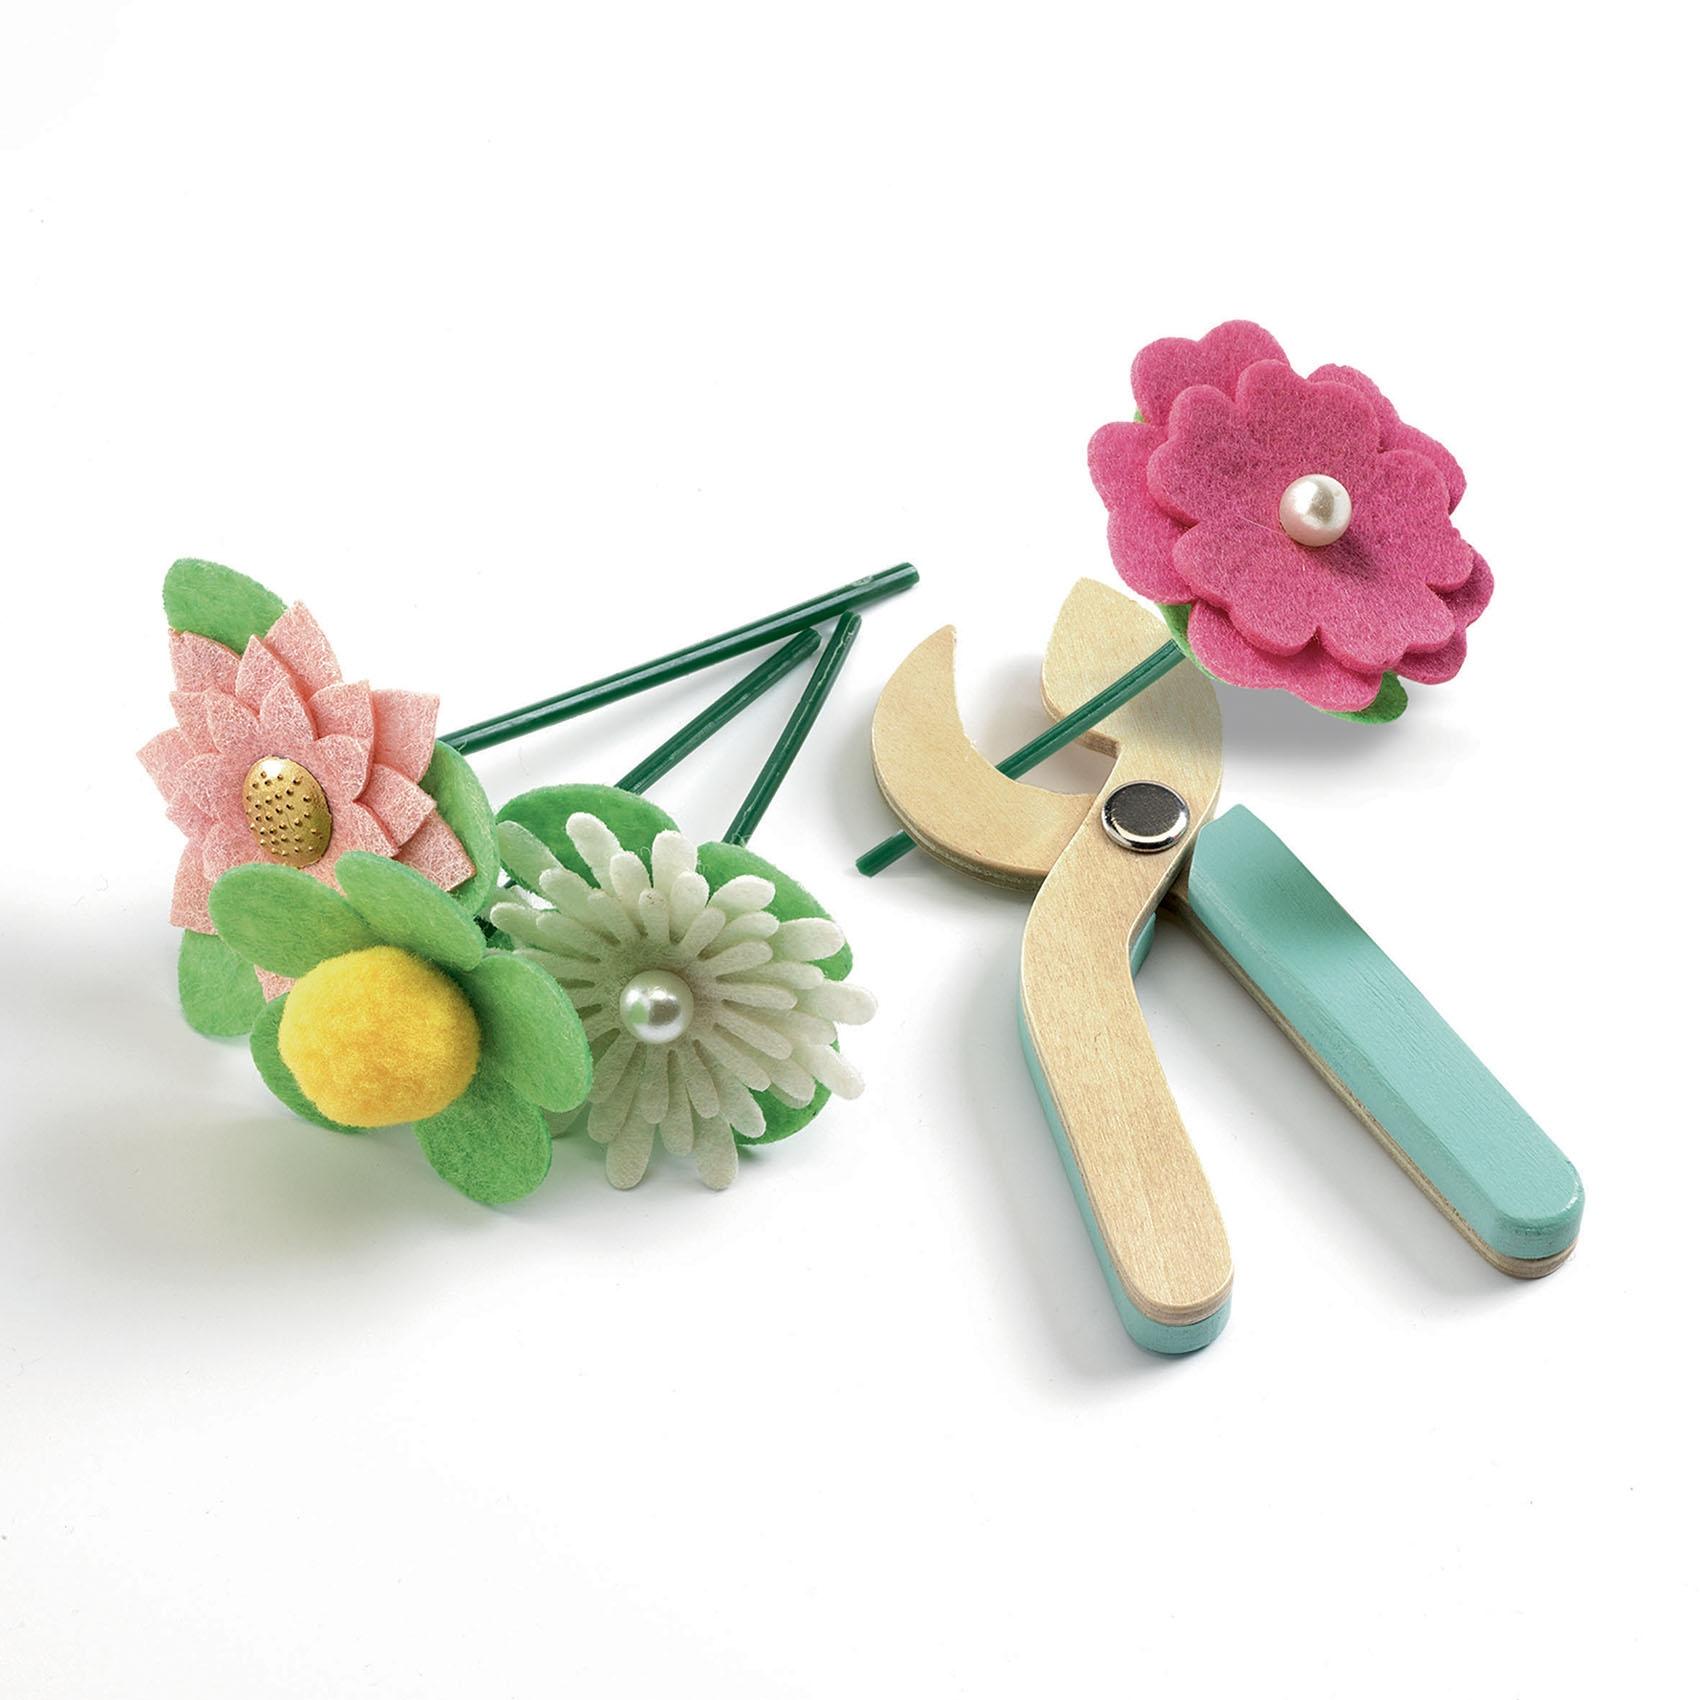 Virágkötő - Rose & Florian - Create bouquets with a model - 1